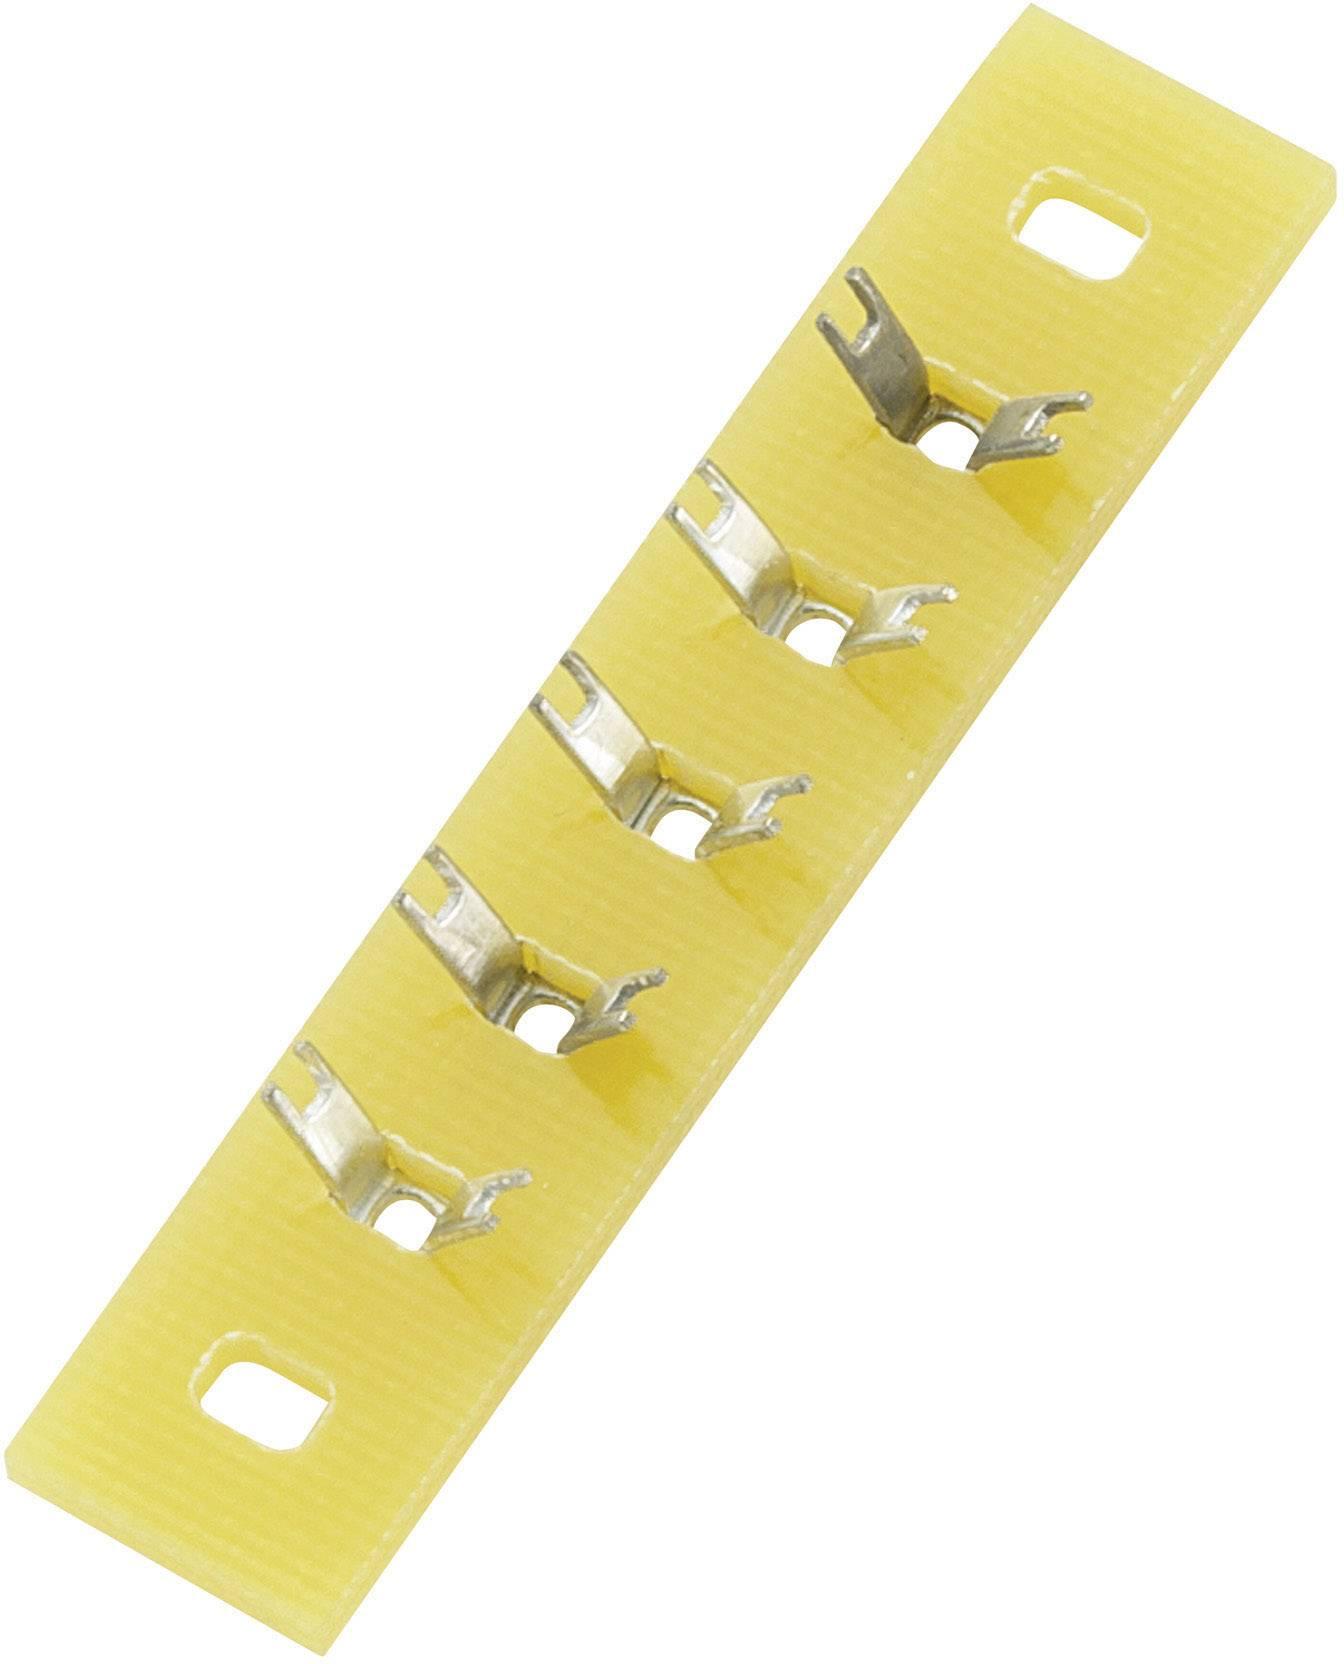 Spájkovacia lišta Conrad Components 530486, pólov 5, (d x š x v) 45 x 9 x 1.5 mm, 1 ks